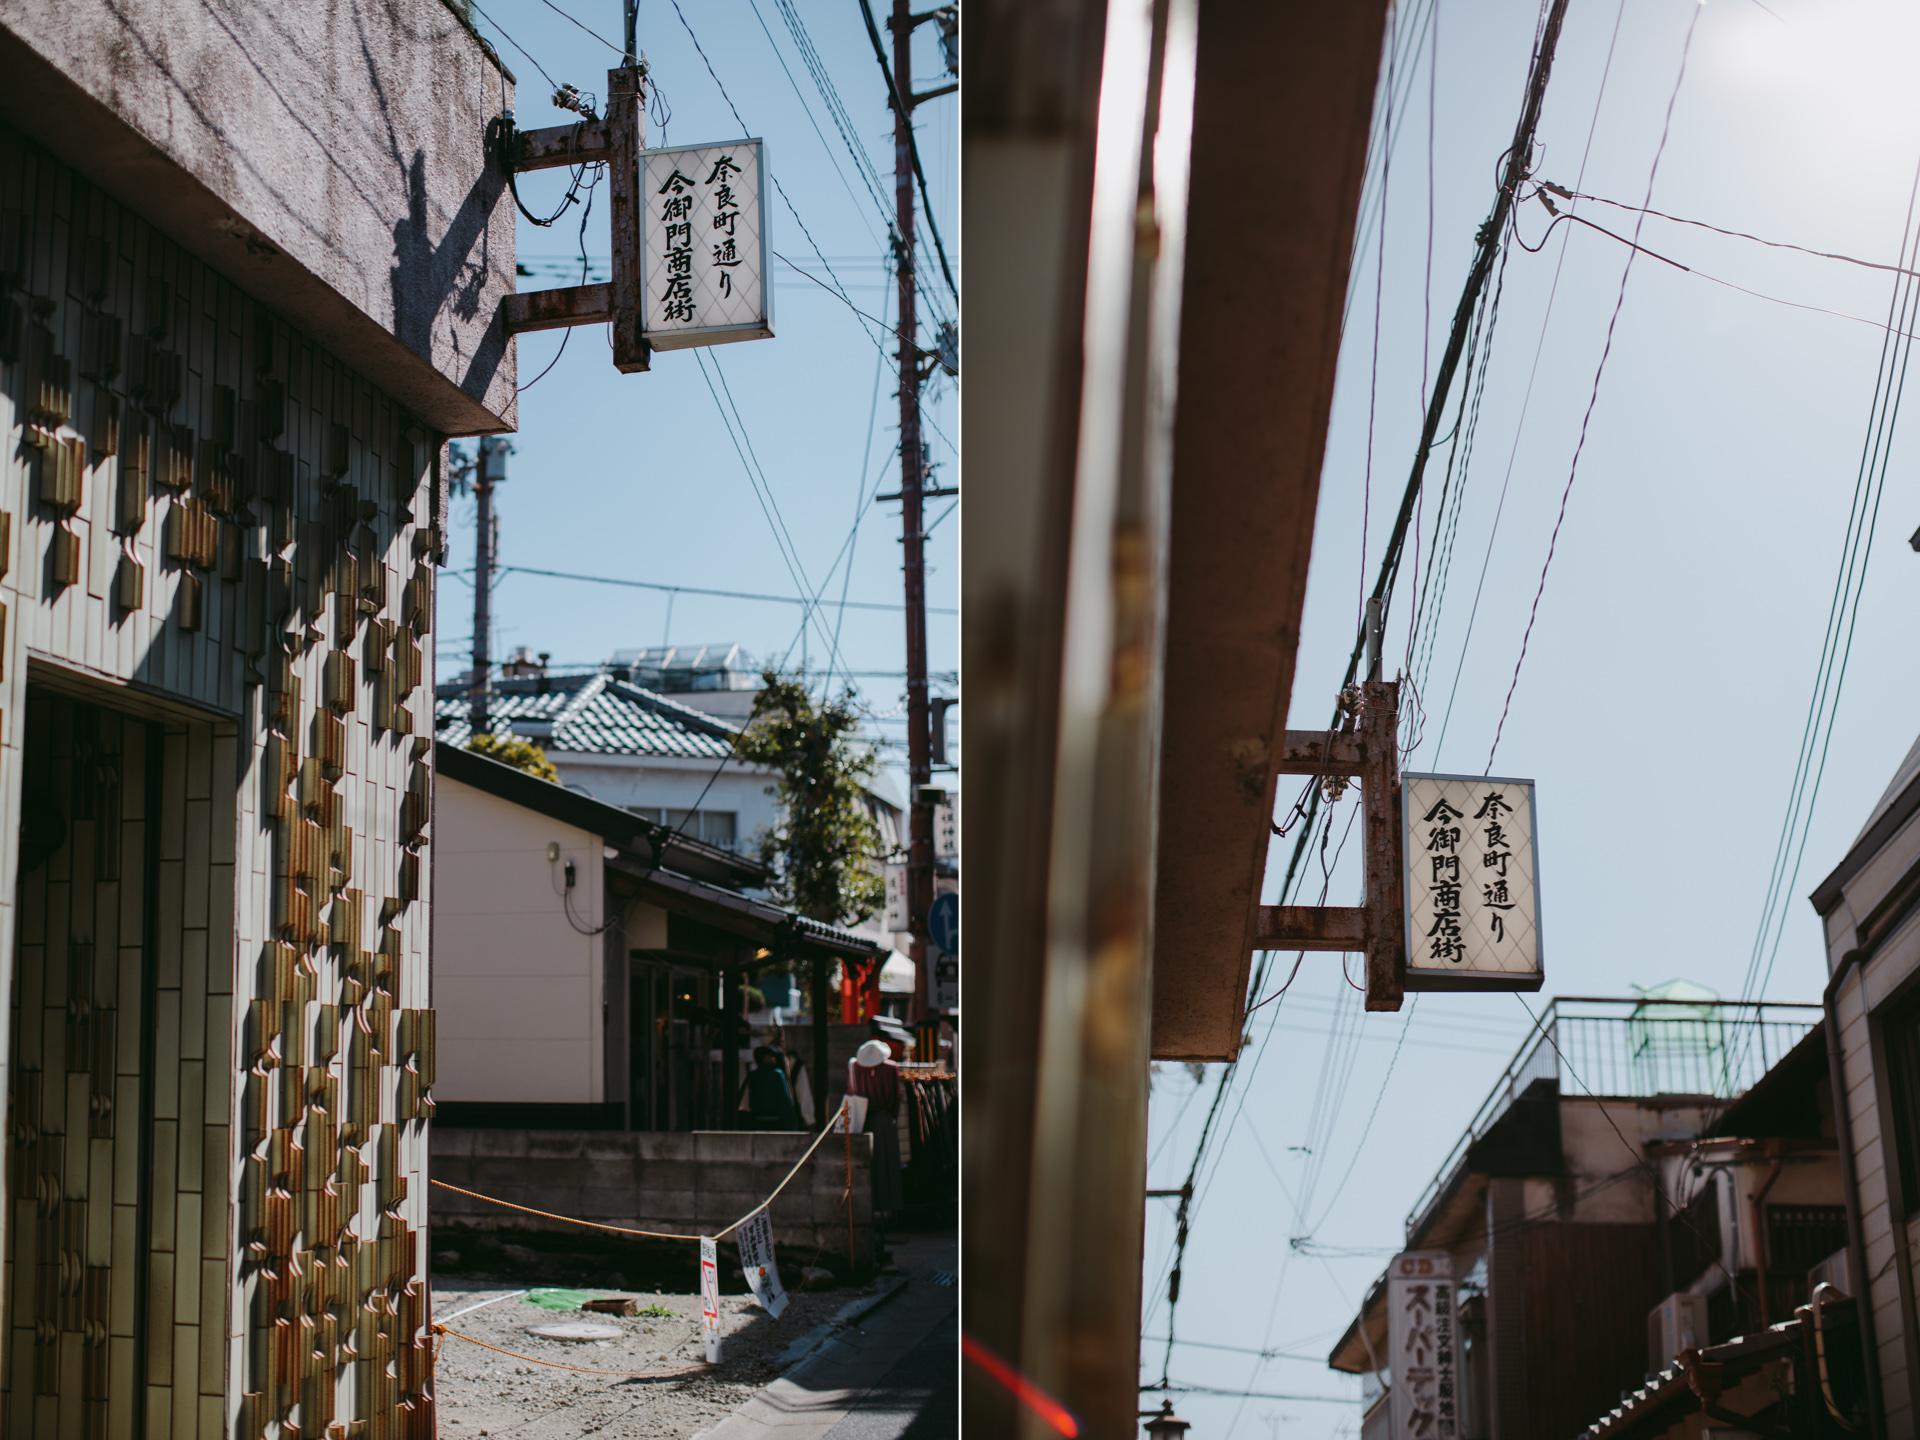 MikeSeehagel-commercial-lifestyle-travel-photography-Japan-V16.jpg